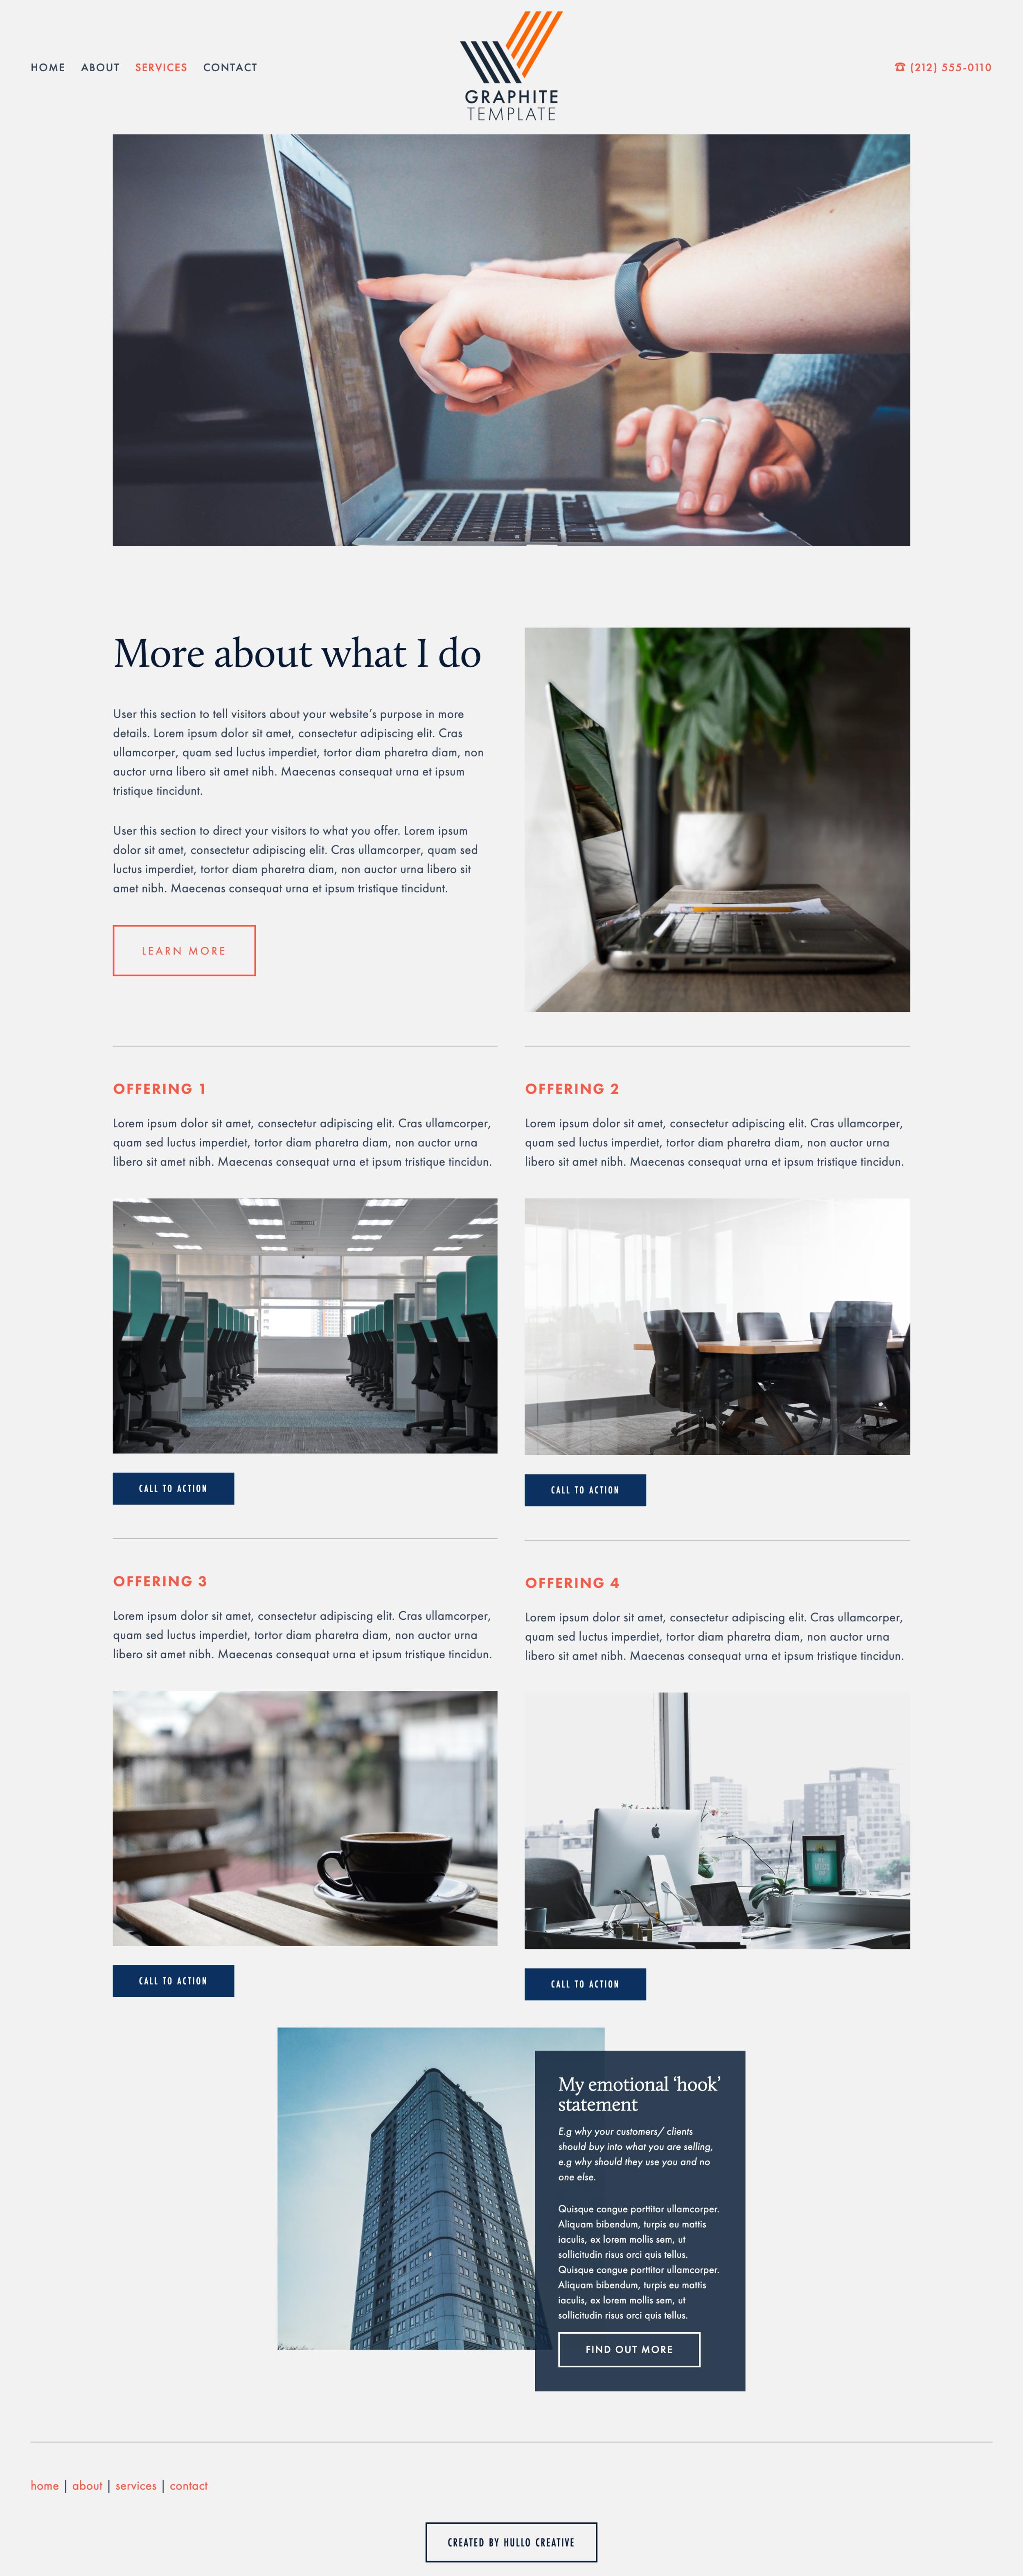 screencapture-graphite-template-squarespace-services-1-2019-10-04-11_25_54.png